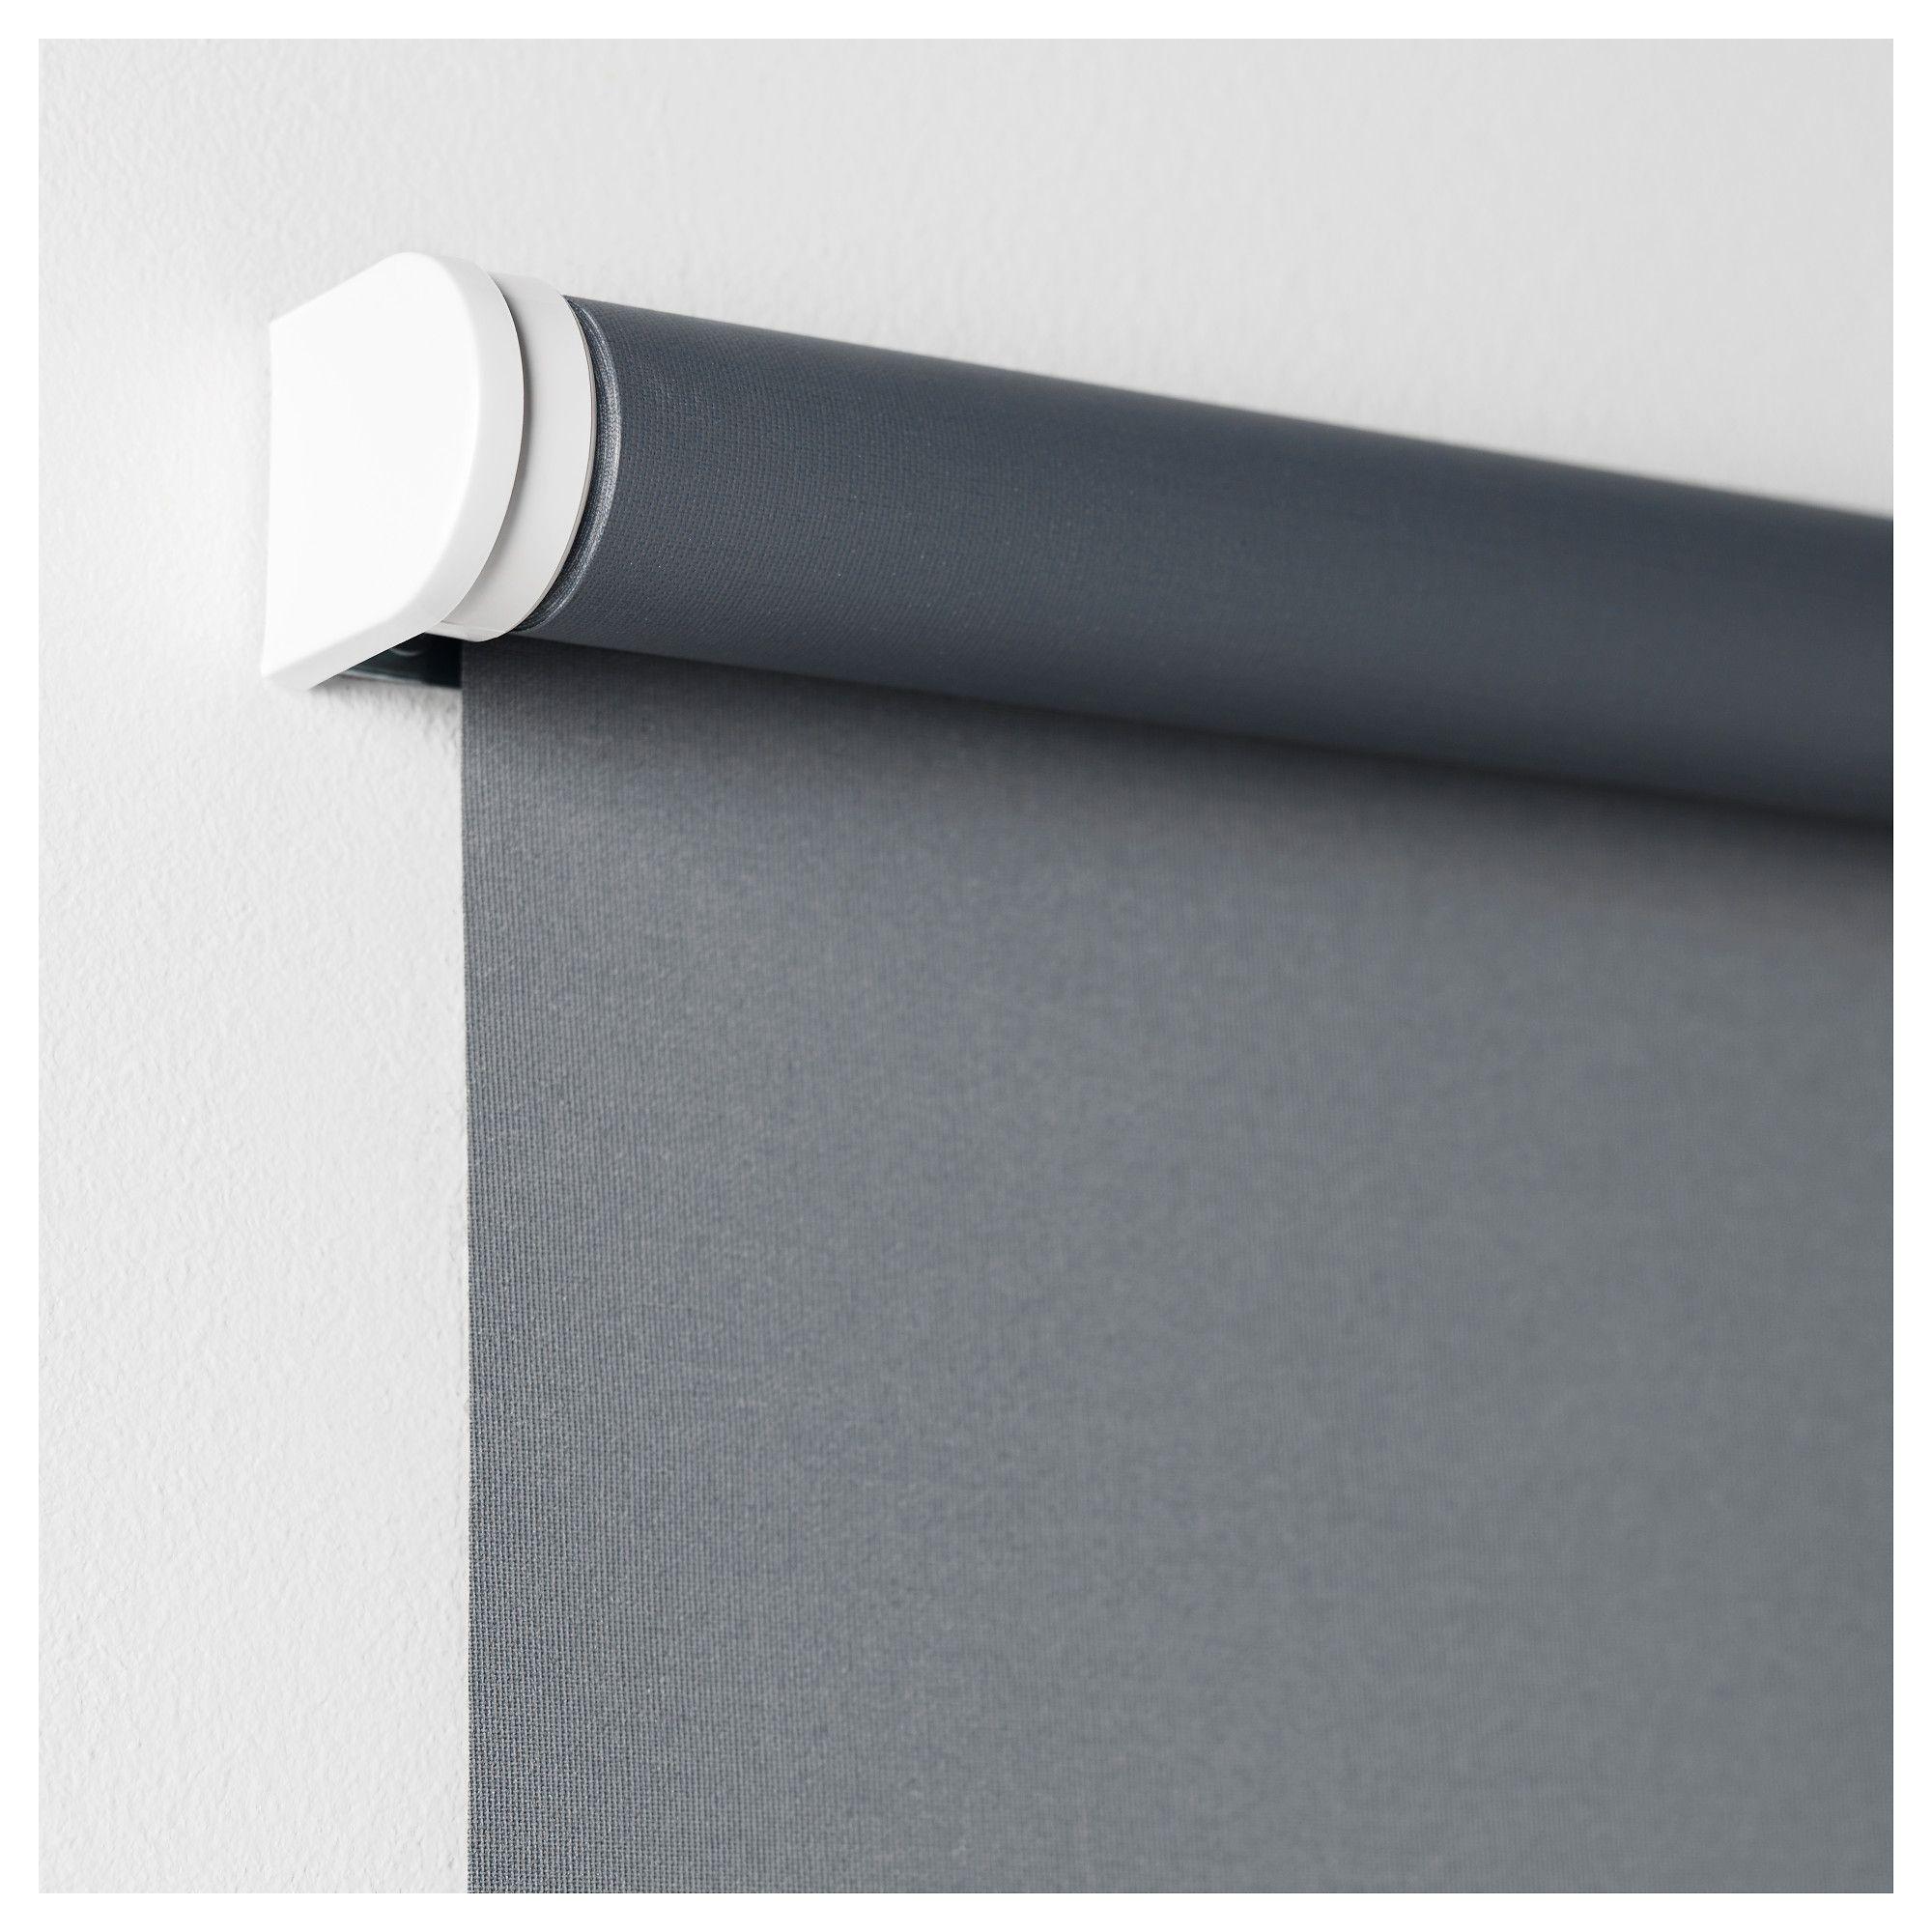 Tupplur Blackout Roller Blind Gray For The Home Grey Roller